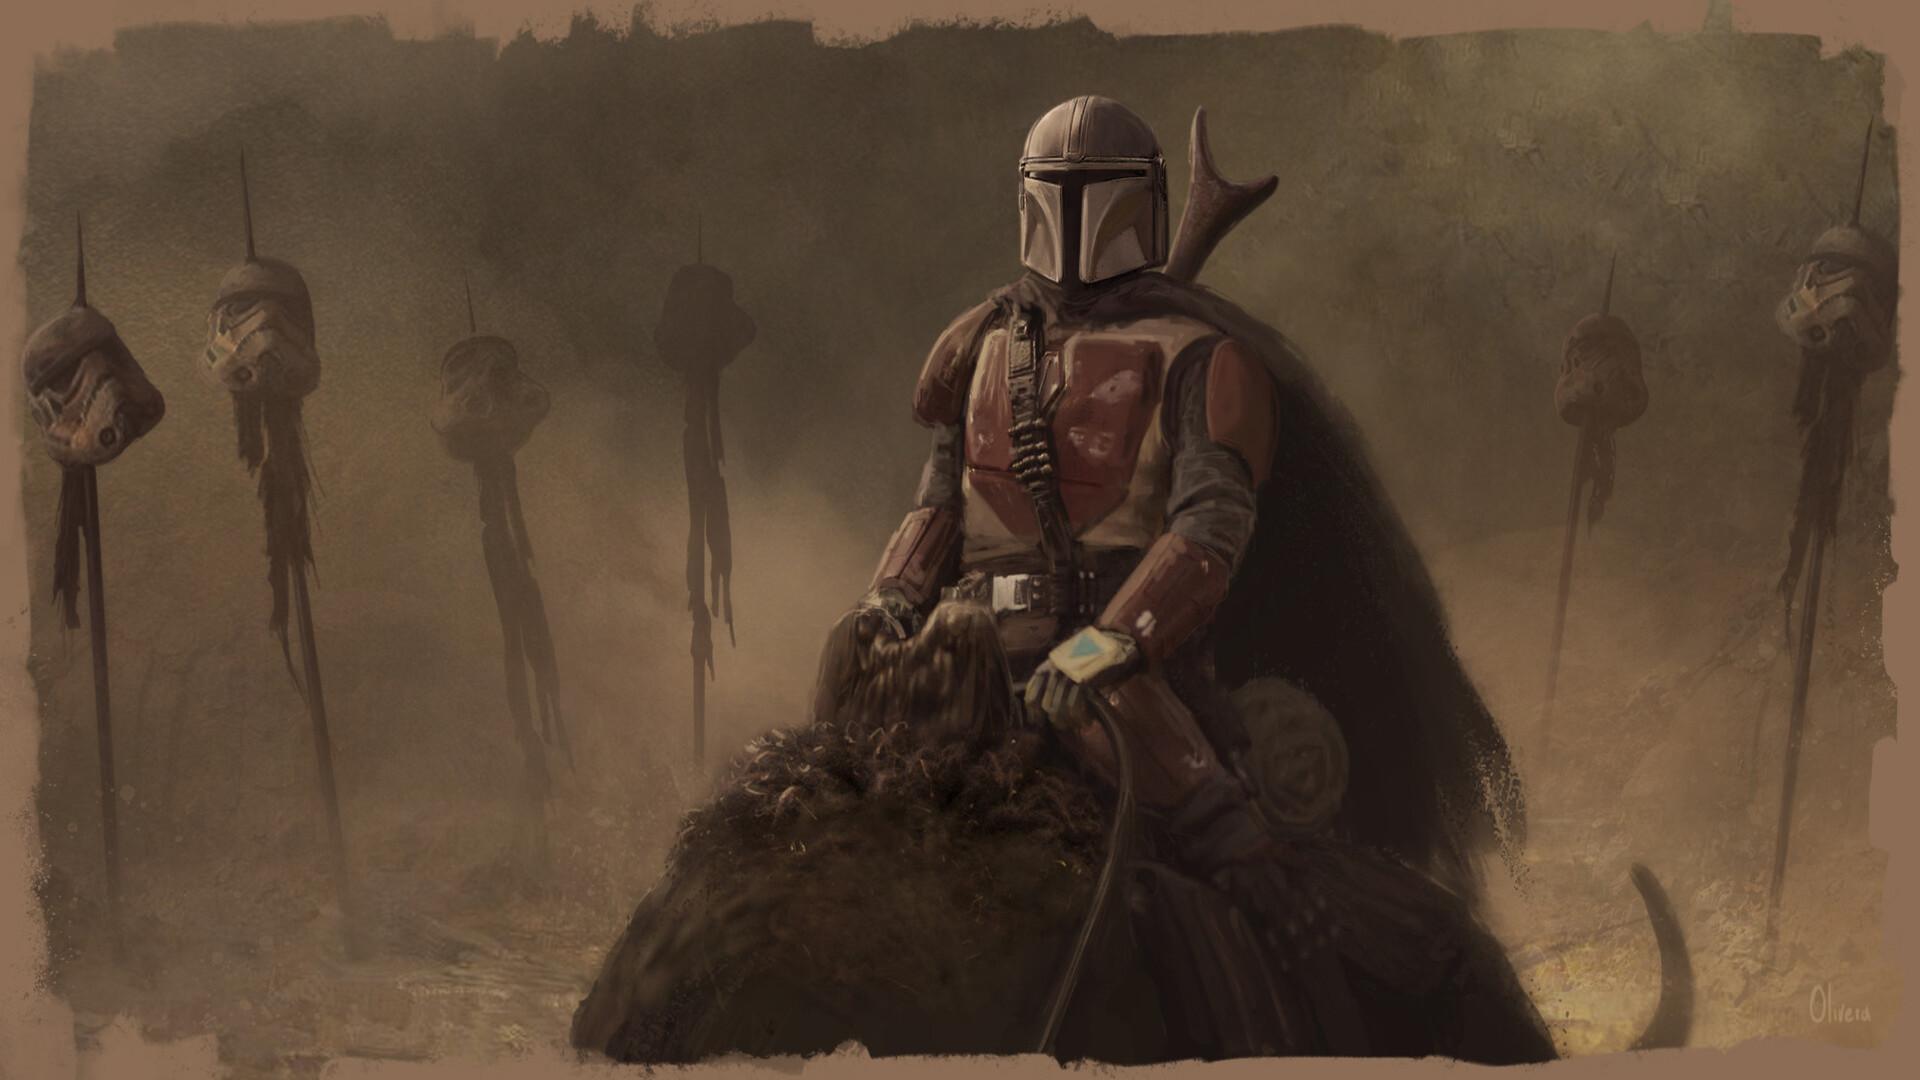 General 1920x1080 The Mandalorian Star Wars TV Series bounty hunter